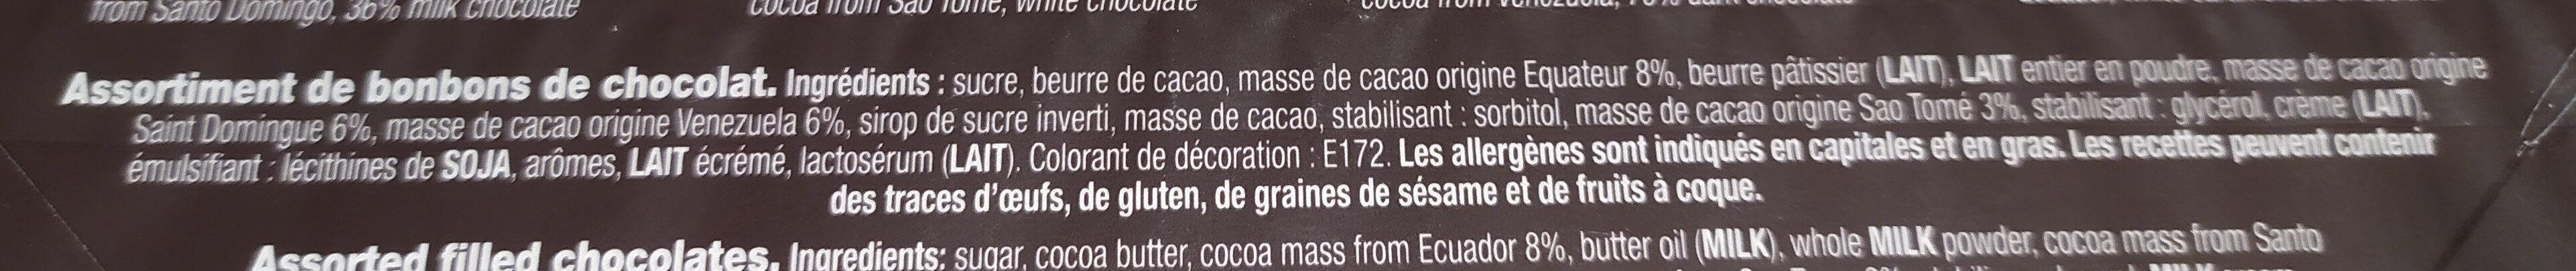 LES PALETS - Ingredients - fr